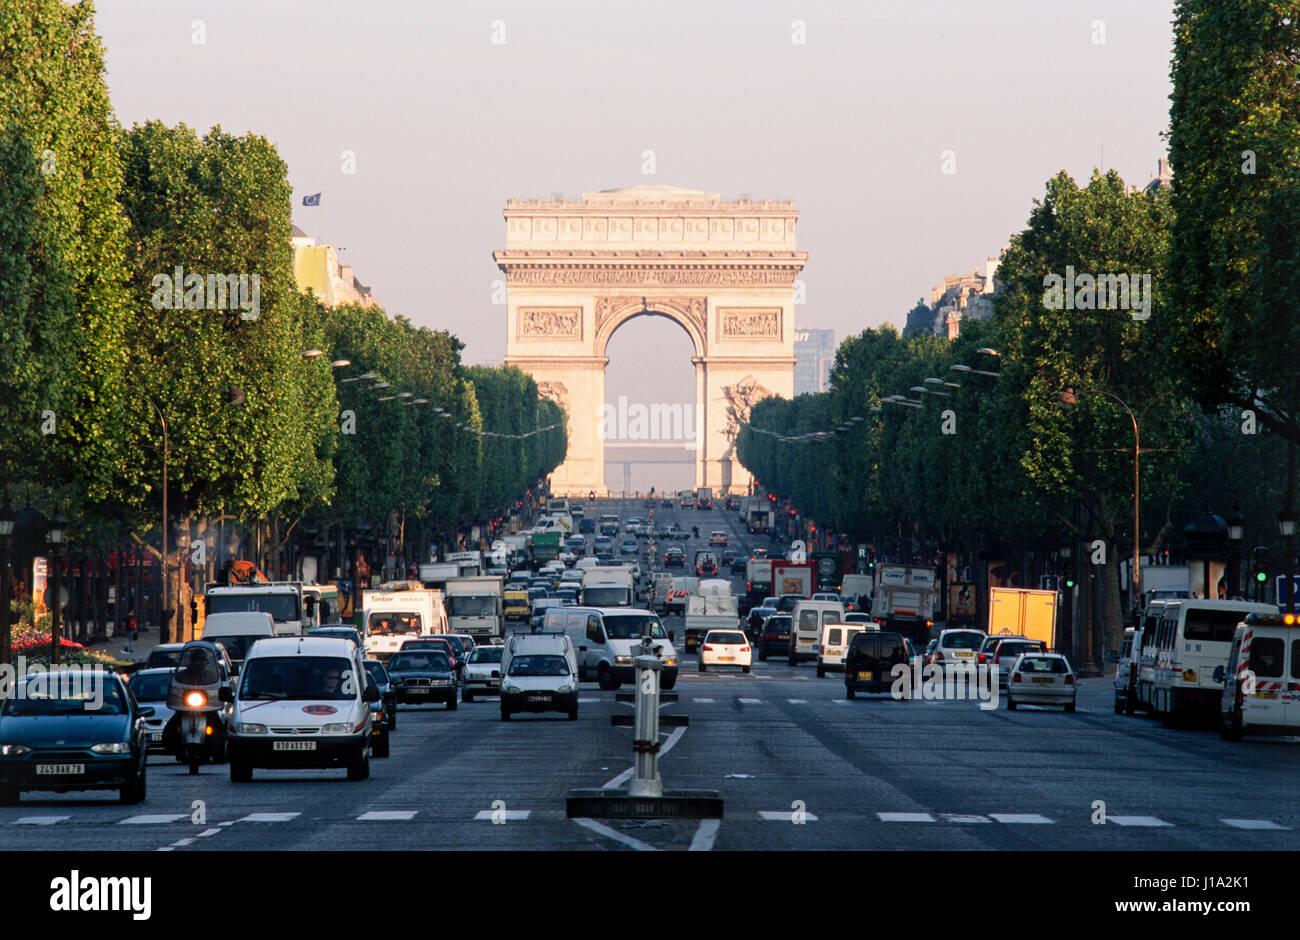 'Champs-Elysees with view of Arc de Triomphe, Paris, France.' - Stock Image